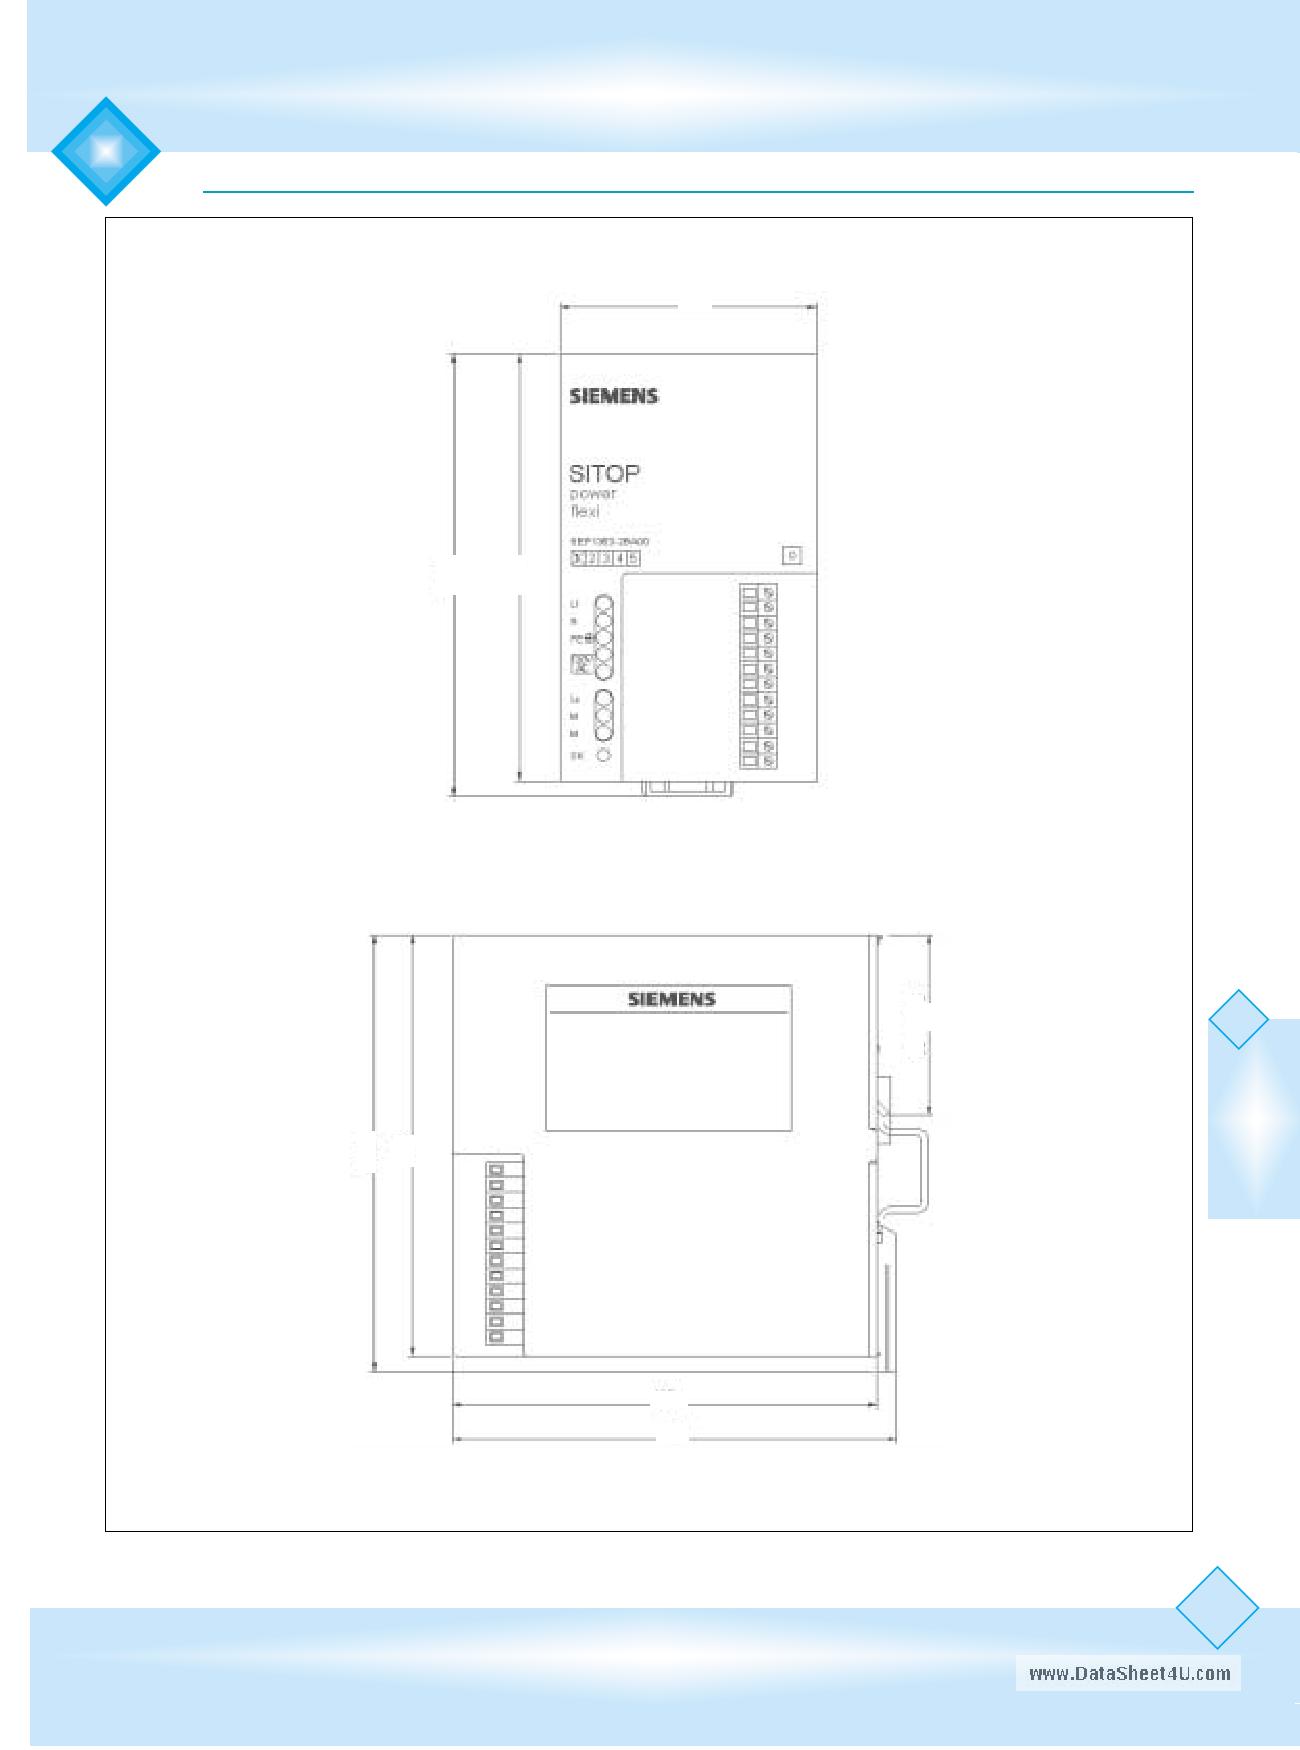 6EP1436-1SH01 pdf schematic